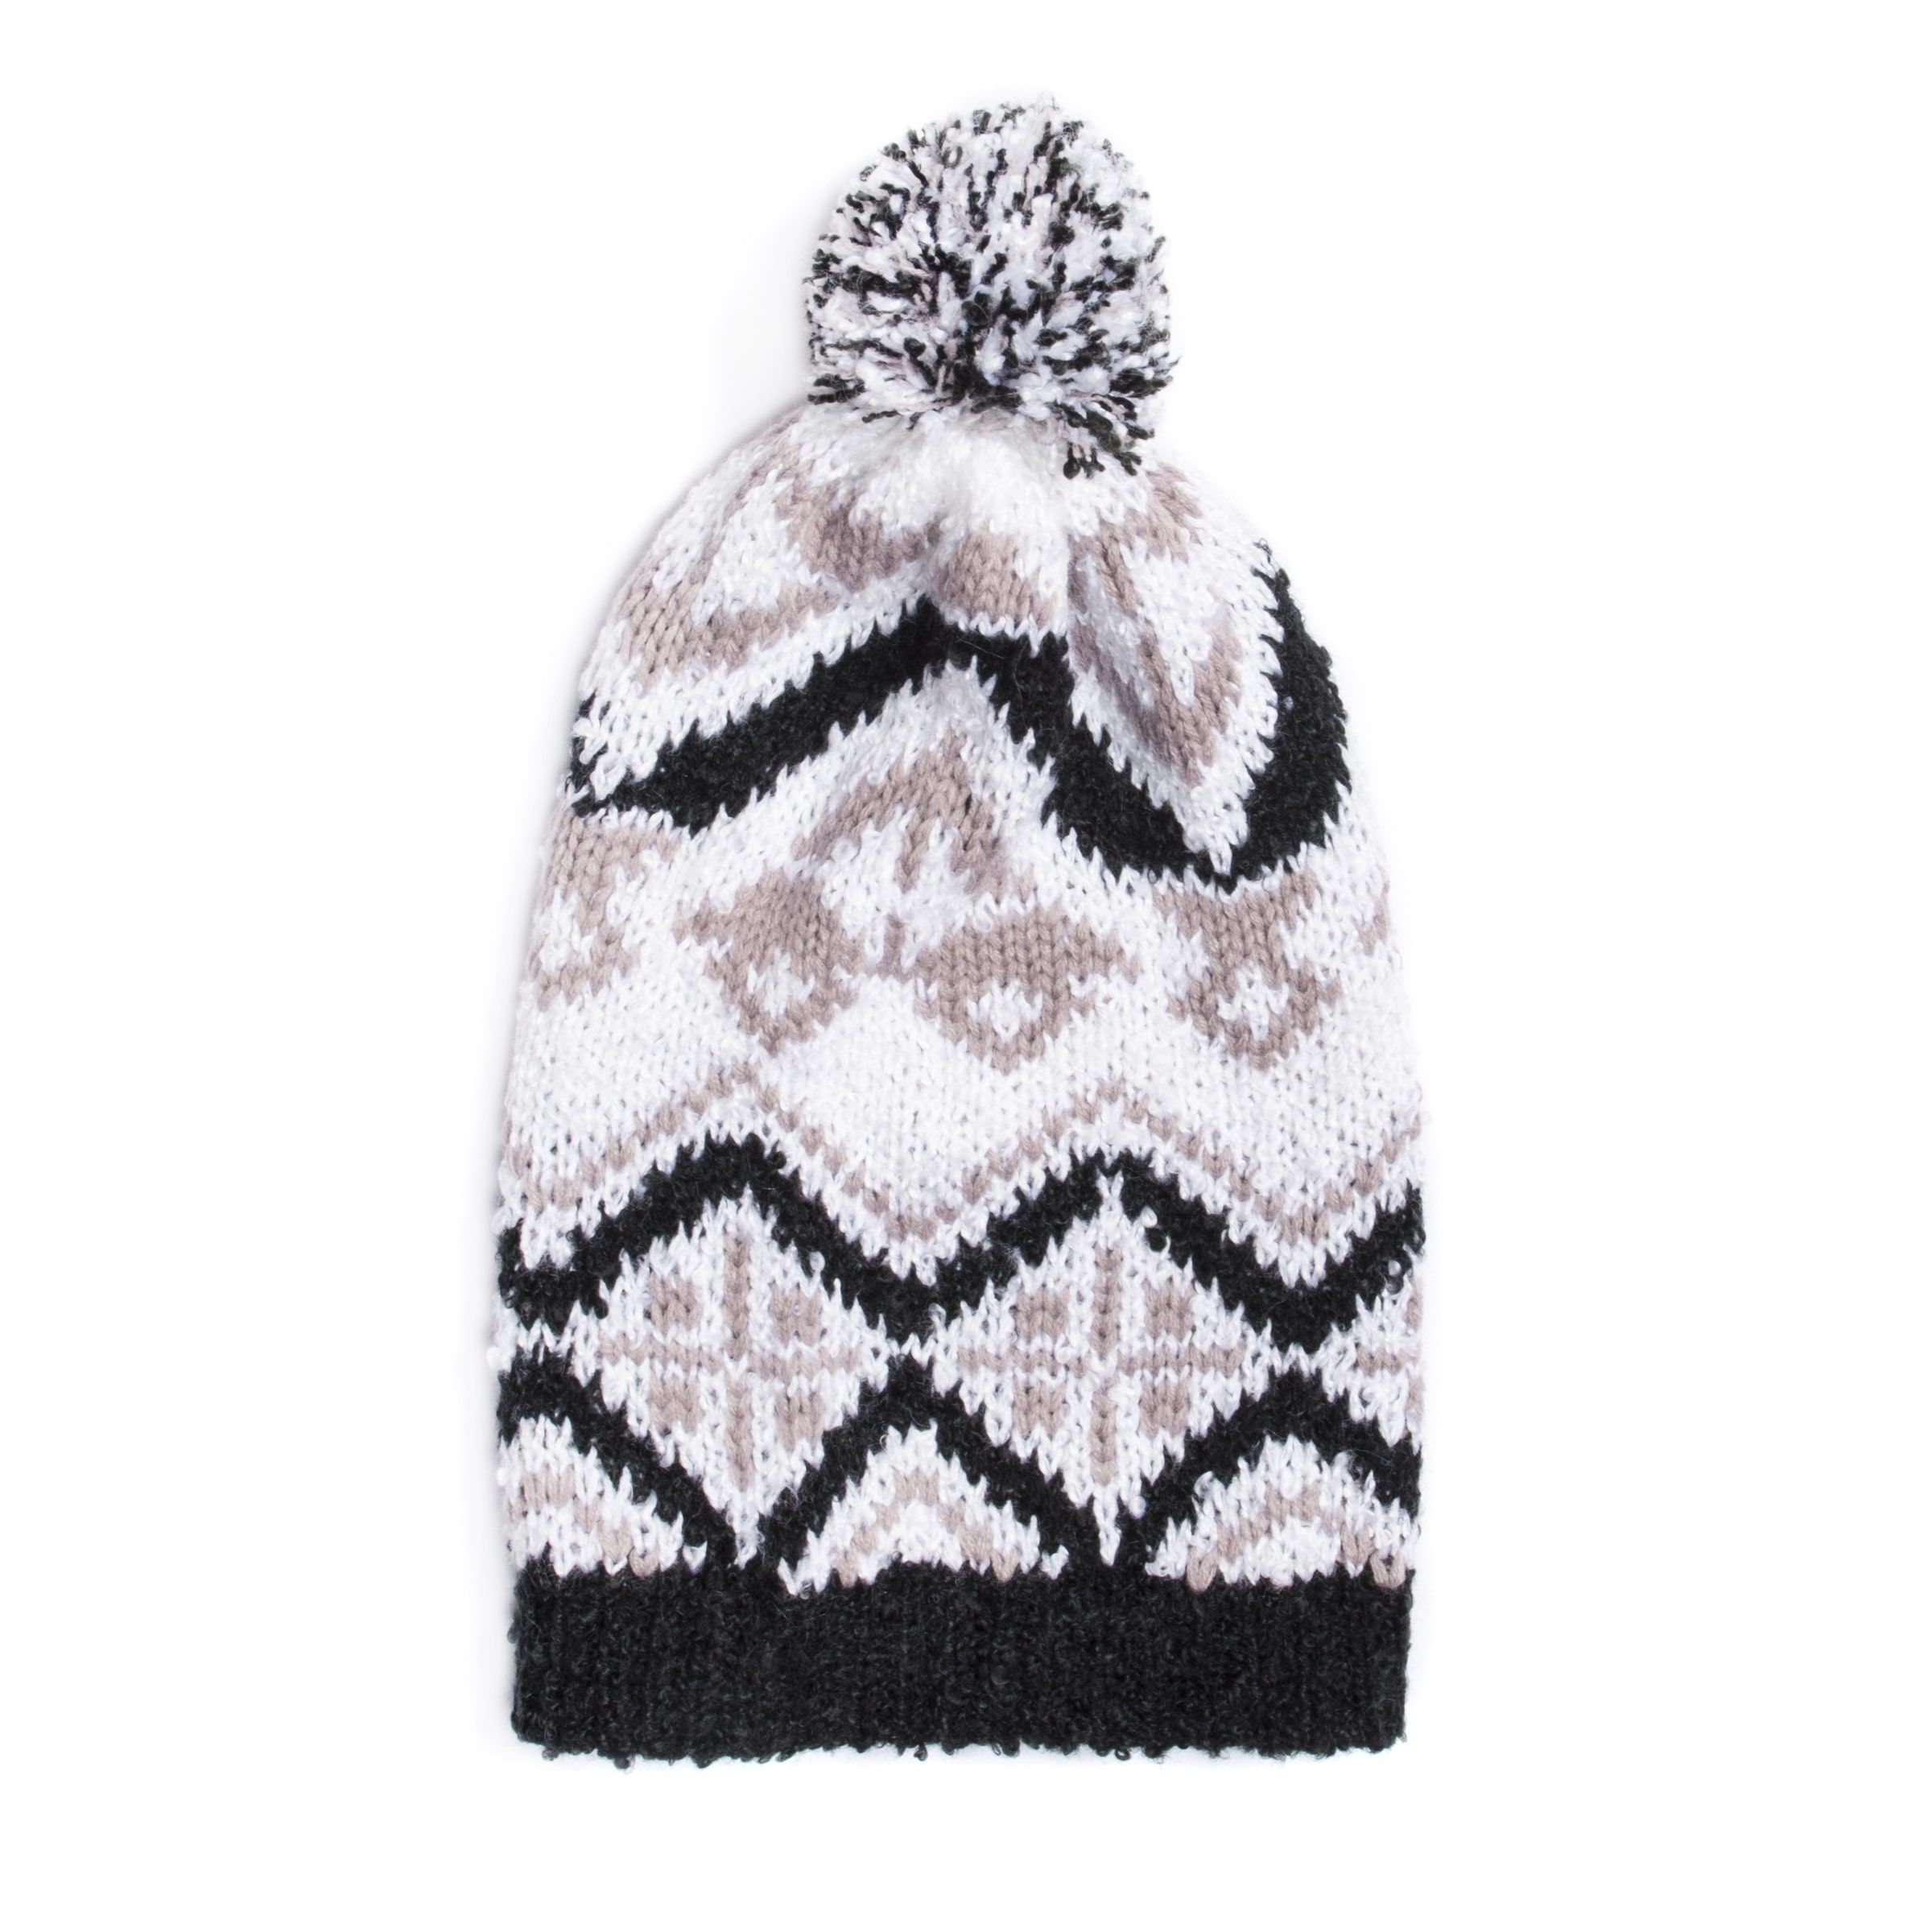 2242e4db3a75f MUK Luks® Women's Tribal Slouch Beanie (Osfm Vanilla (White)), Size One  Size (acrylic)